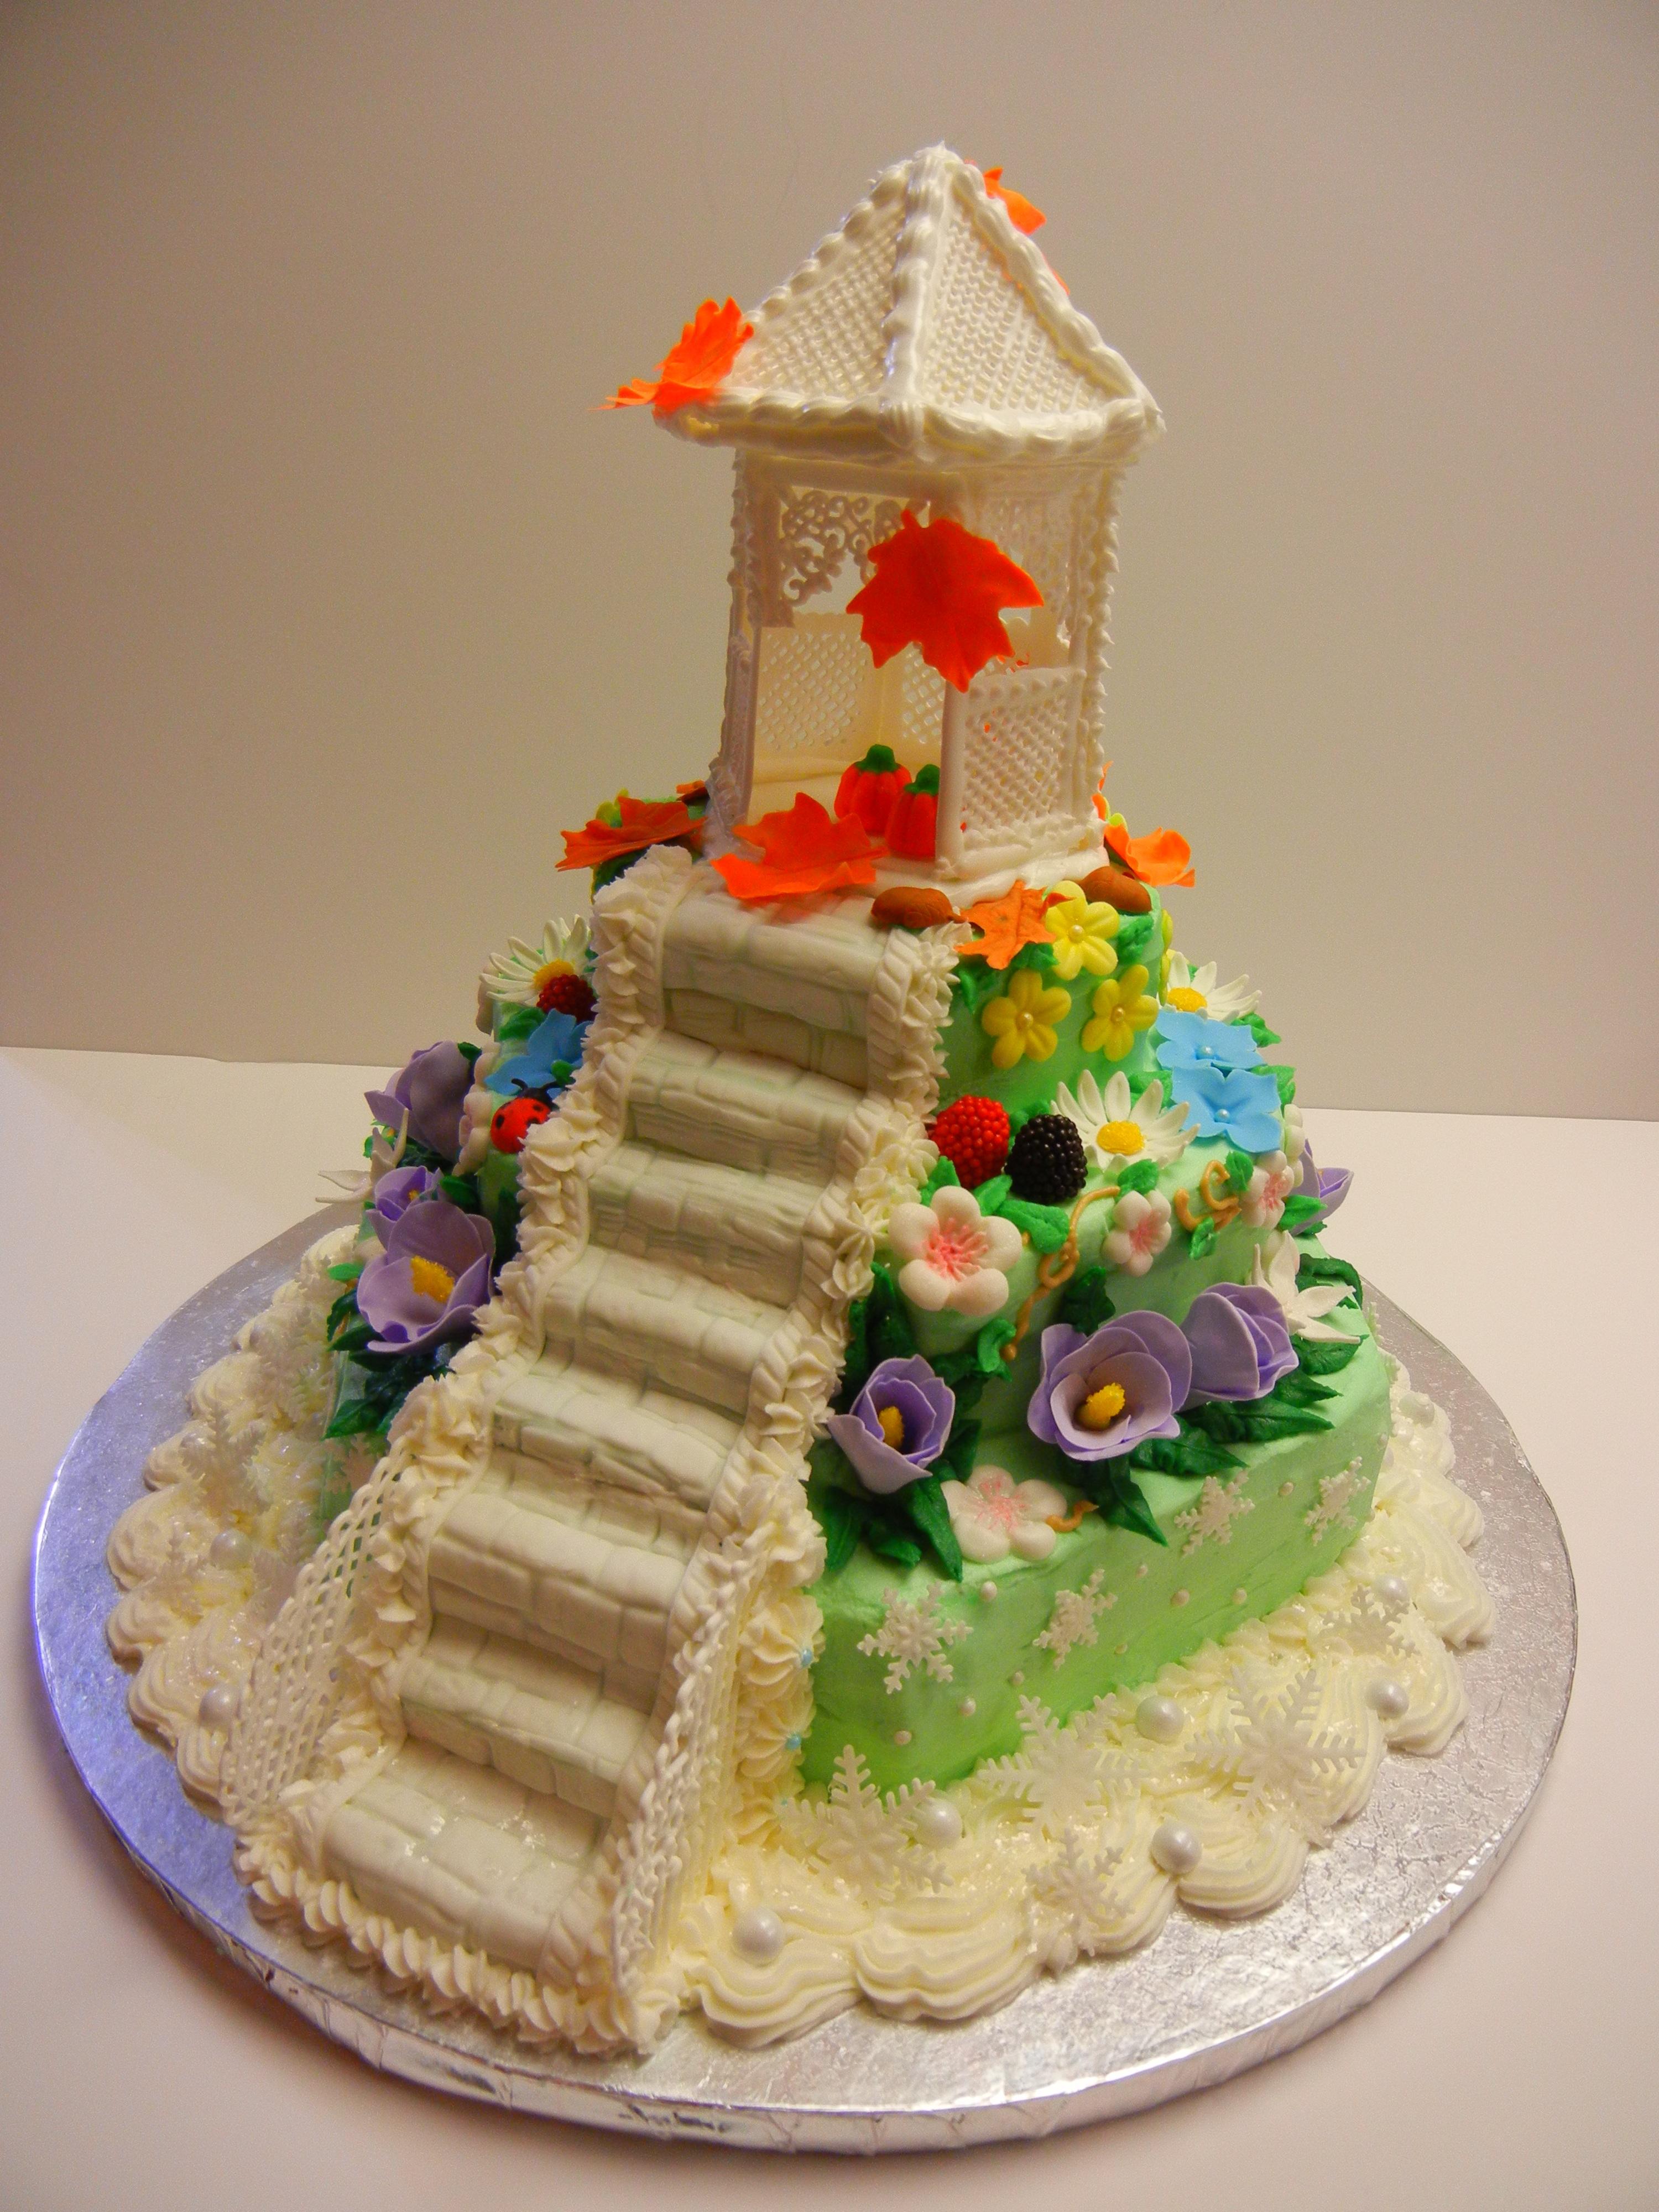 fotos gratis comida postre cocina pastel de cumpleaos decoracin navidea formacin de hielo productos horneados pasteles pastel de boda torta